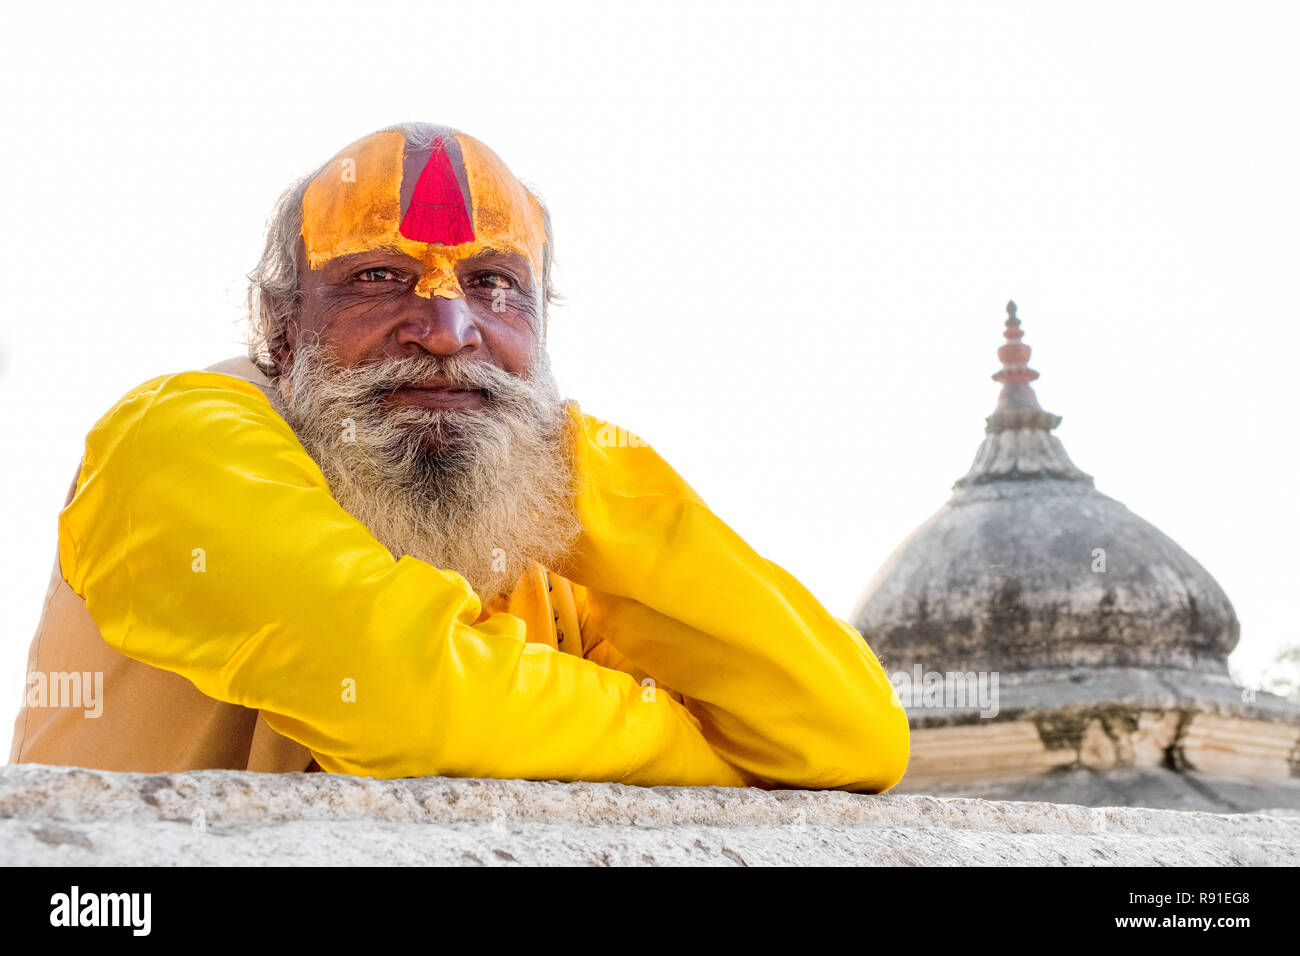 Hindhu Sadhu ( holy man ) at Pashupatinath temple, Kathmandu, Nepal - Stock Image